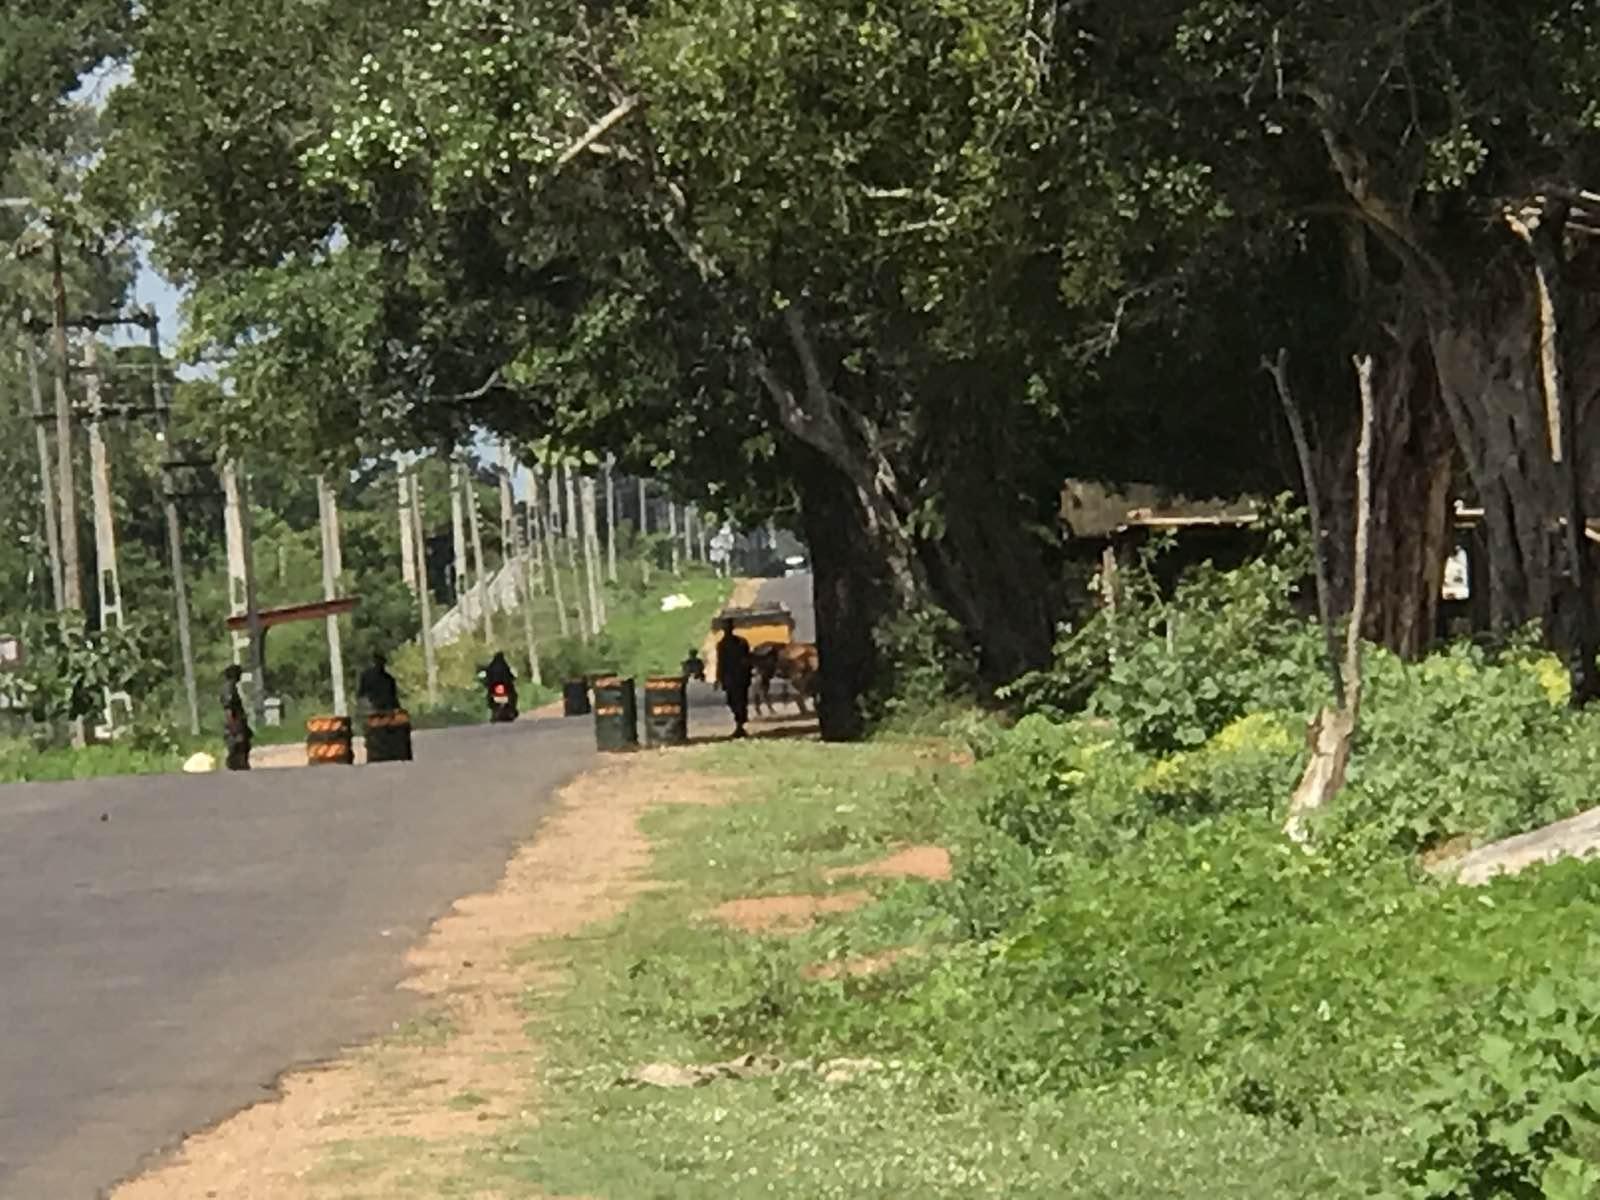 Image result for வவுனியா மன்னார் வீதி பம்பைமடு பகுதியில் இராணுவத்தினரால் சோதனை சாவடி